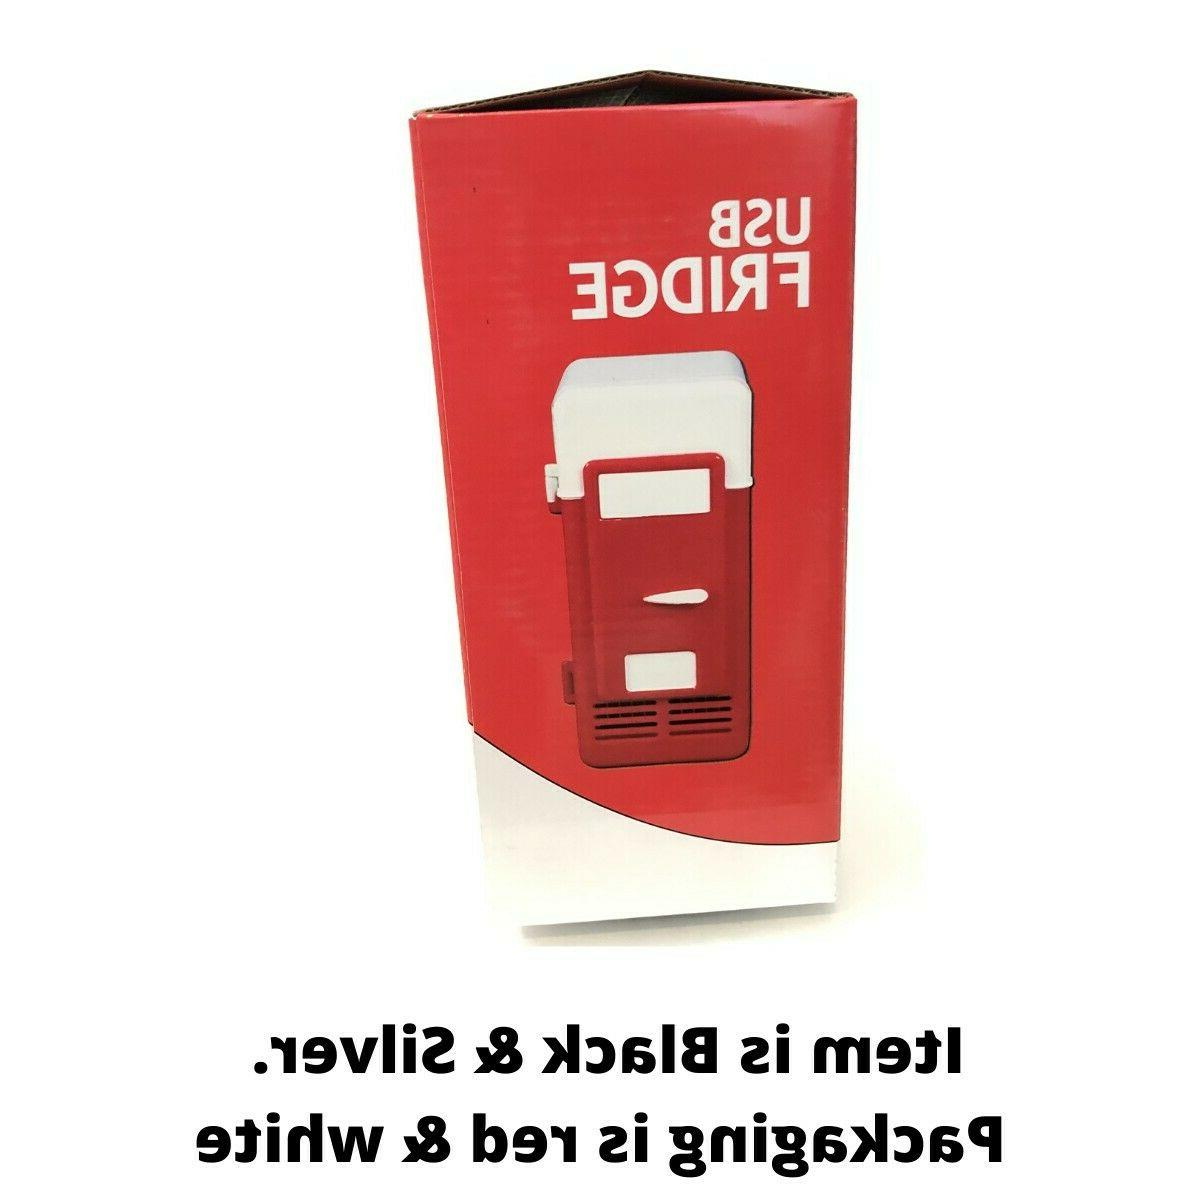 2 1 Mini USB Gadget Beverage Cans Cooler Warmer Refrigerator